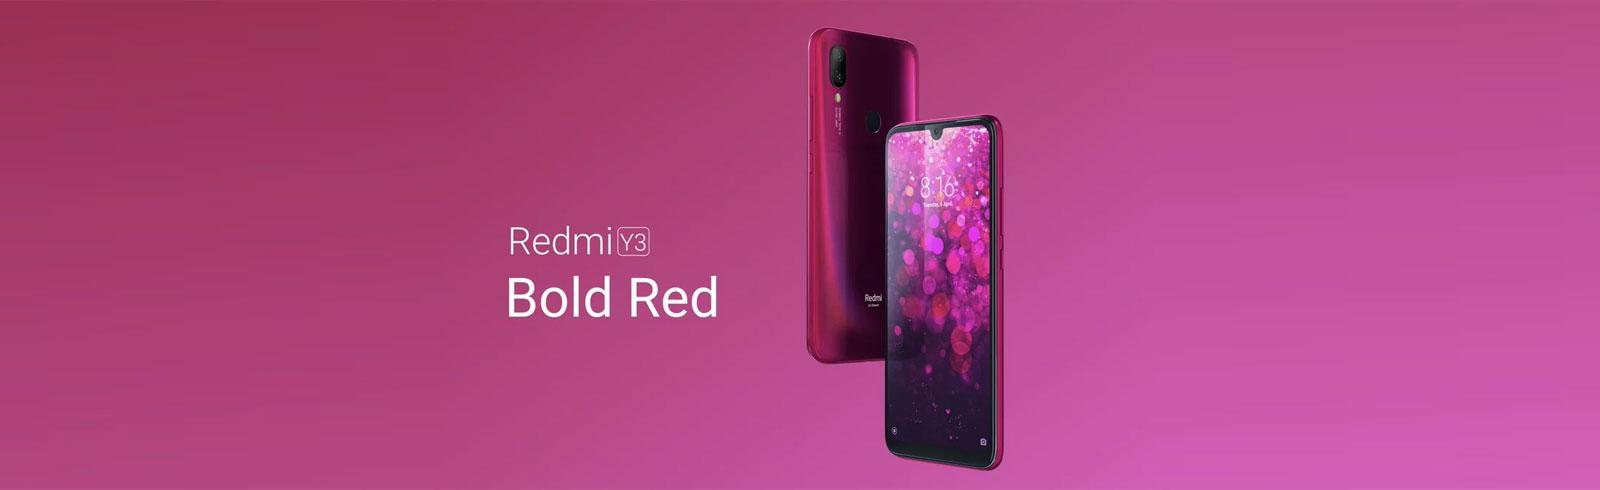 Xiaomi Redmi Y3 has been announced in India